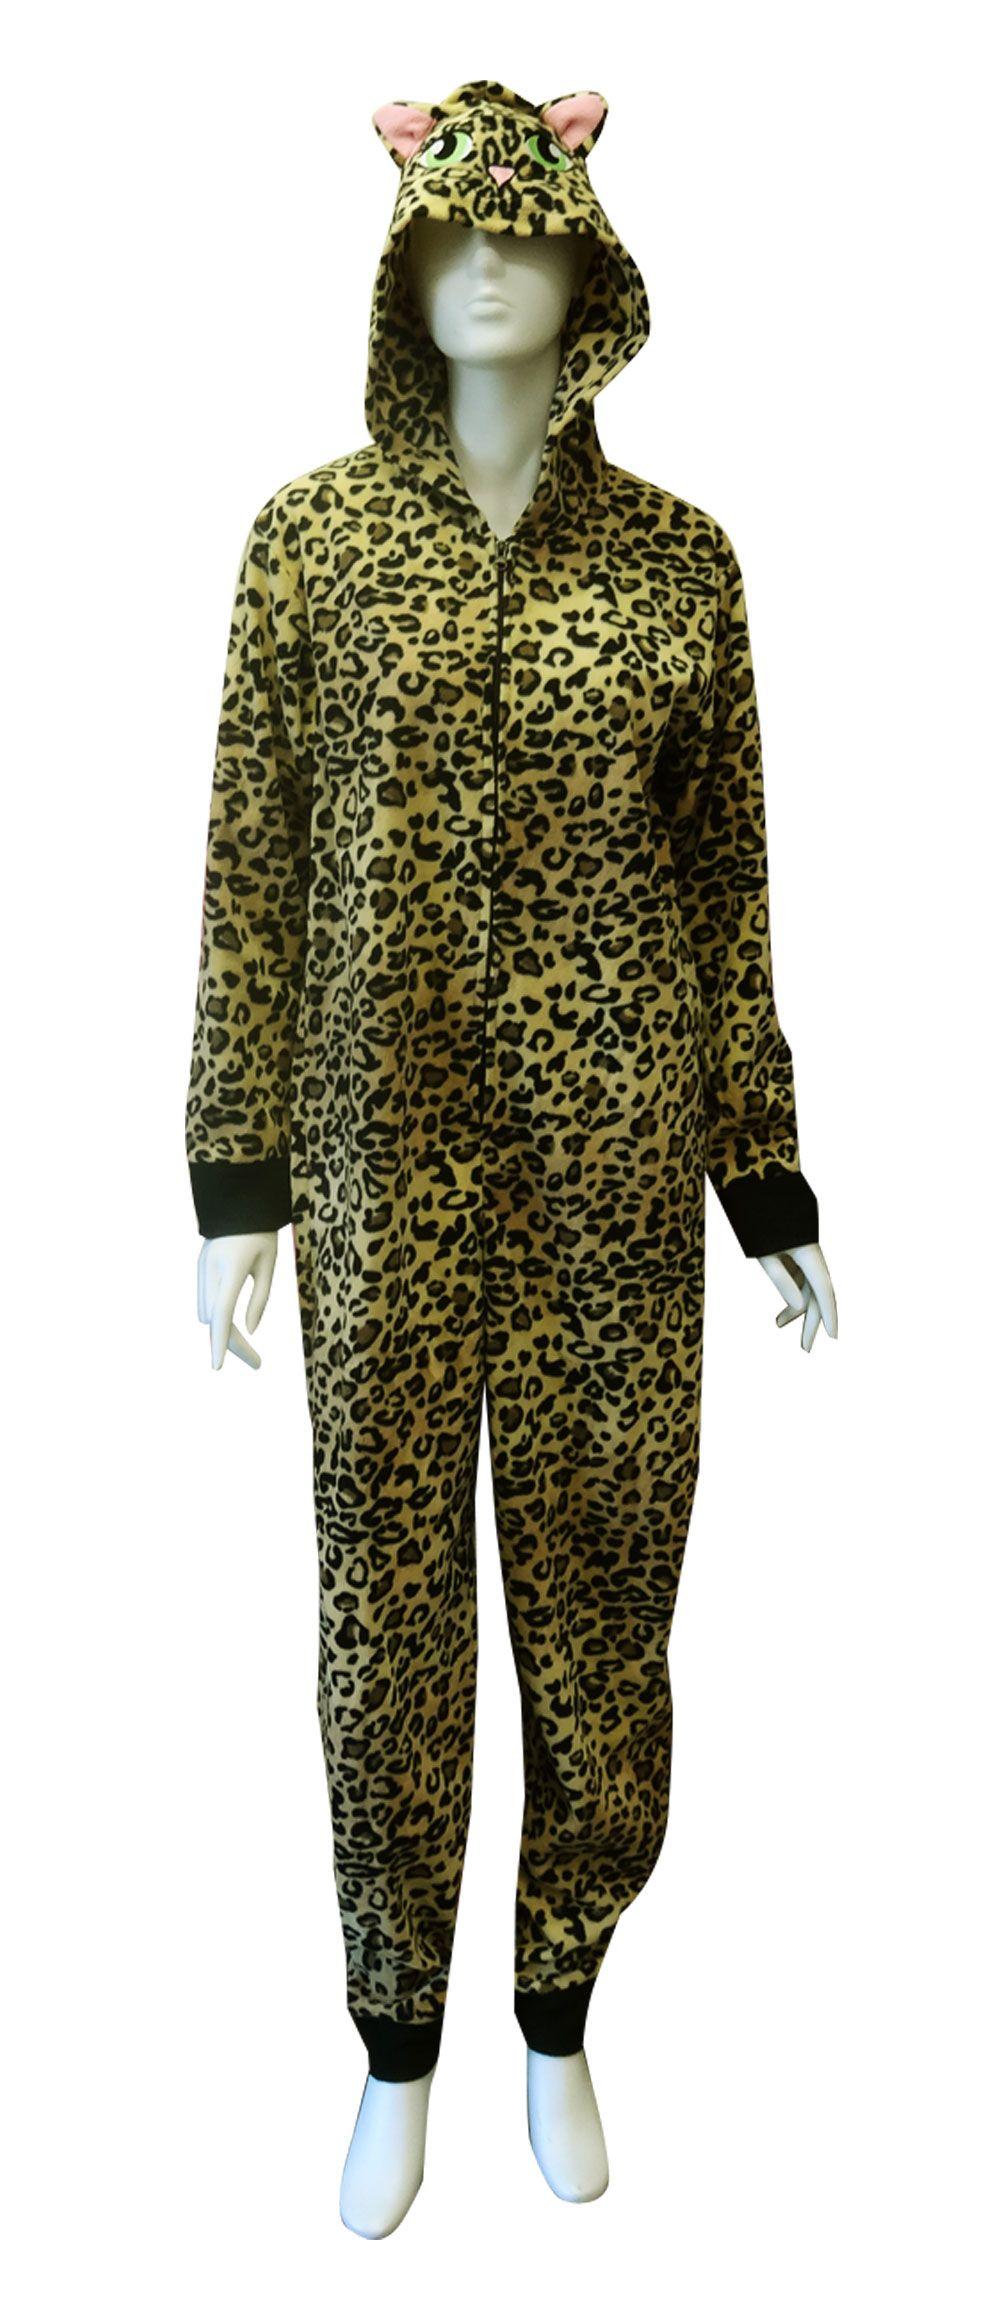 Jungle Leopard Print Hooded Onesie Footed Pajama Adult